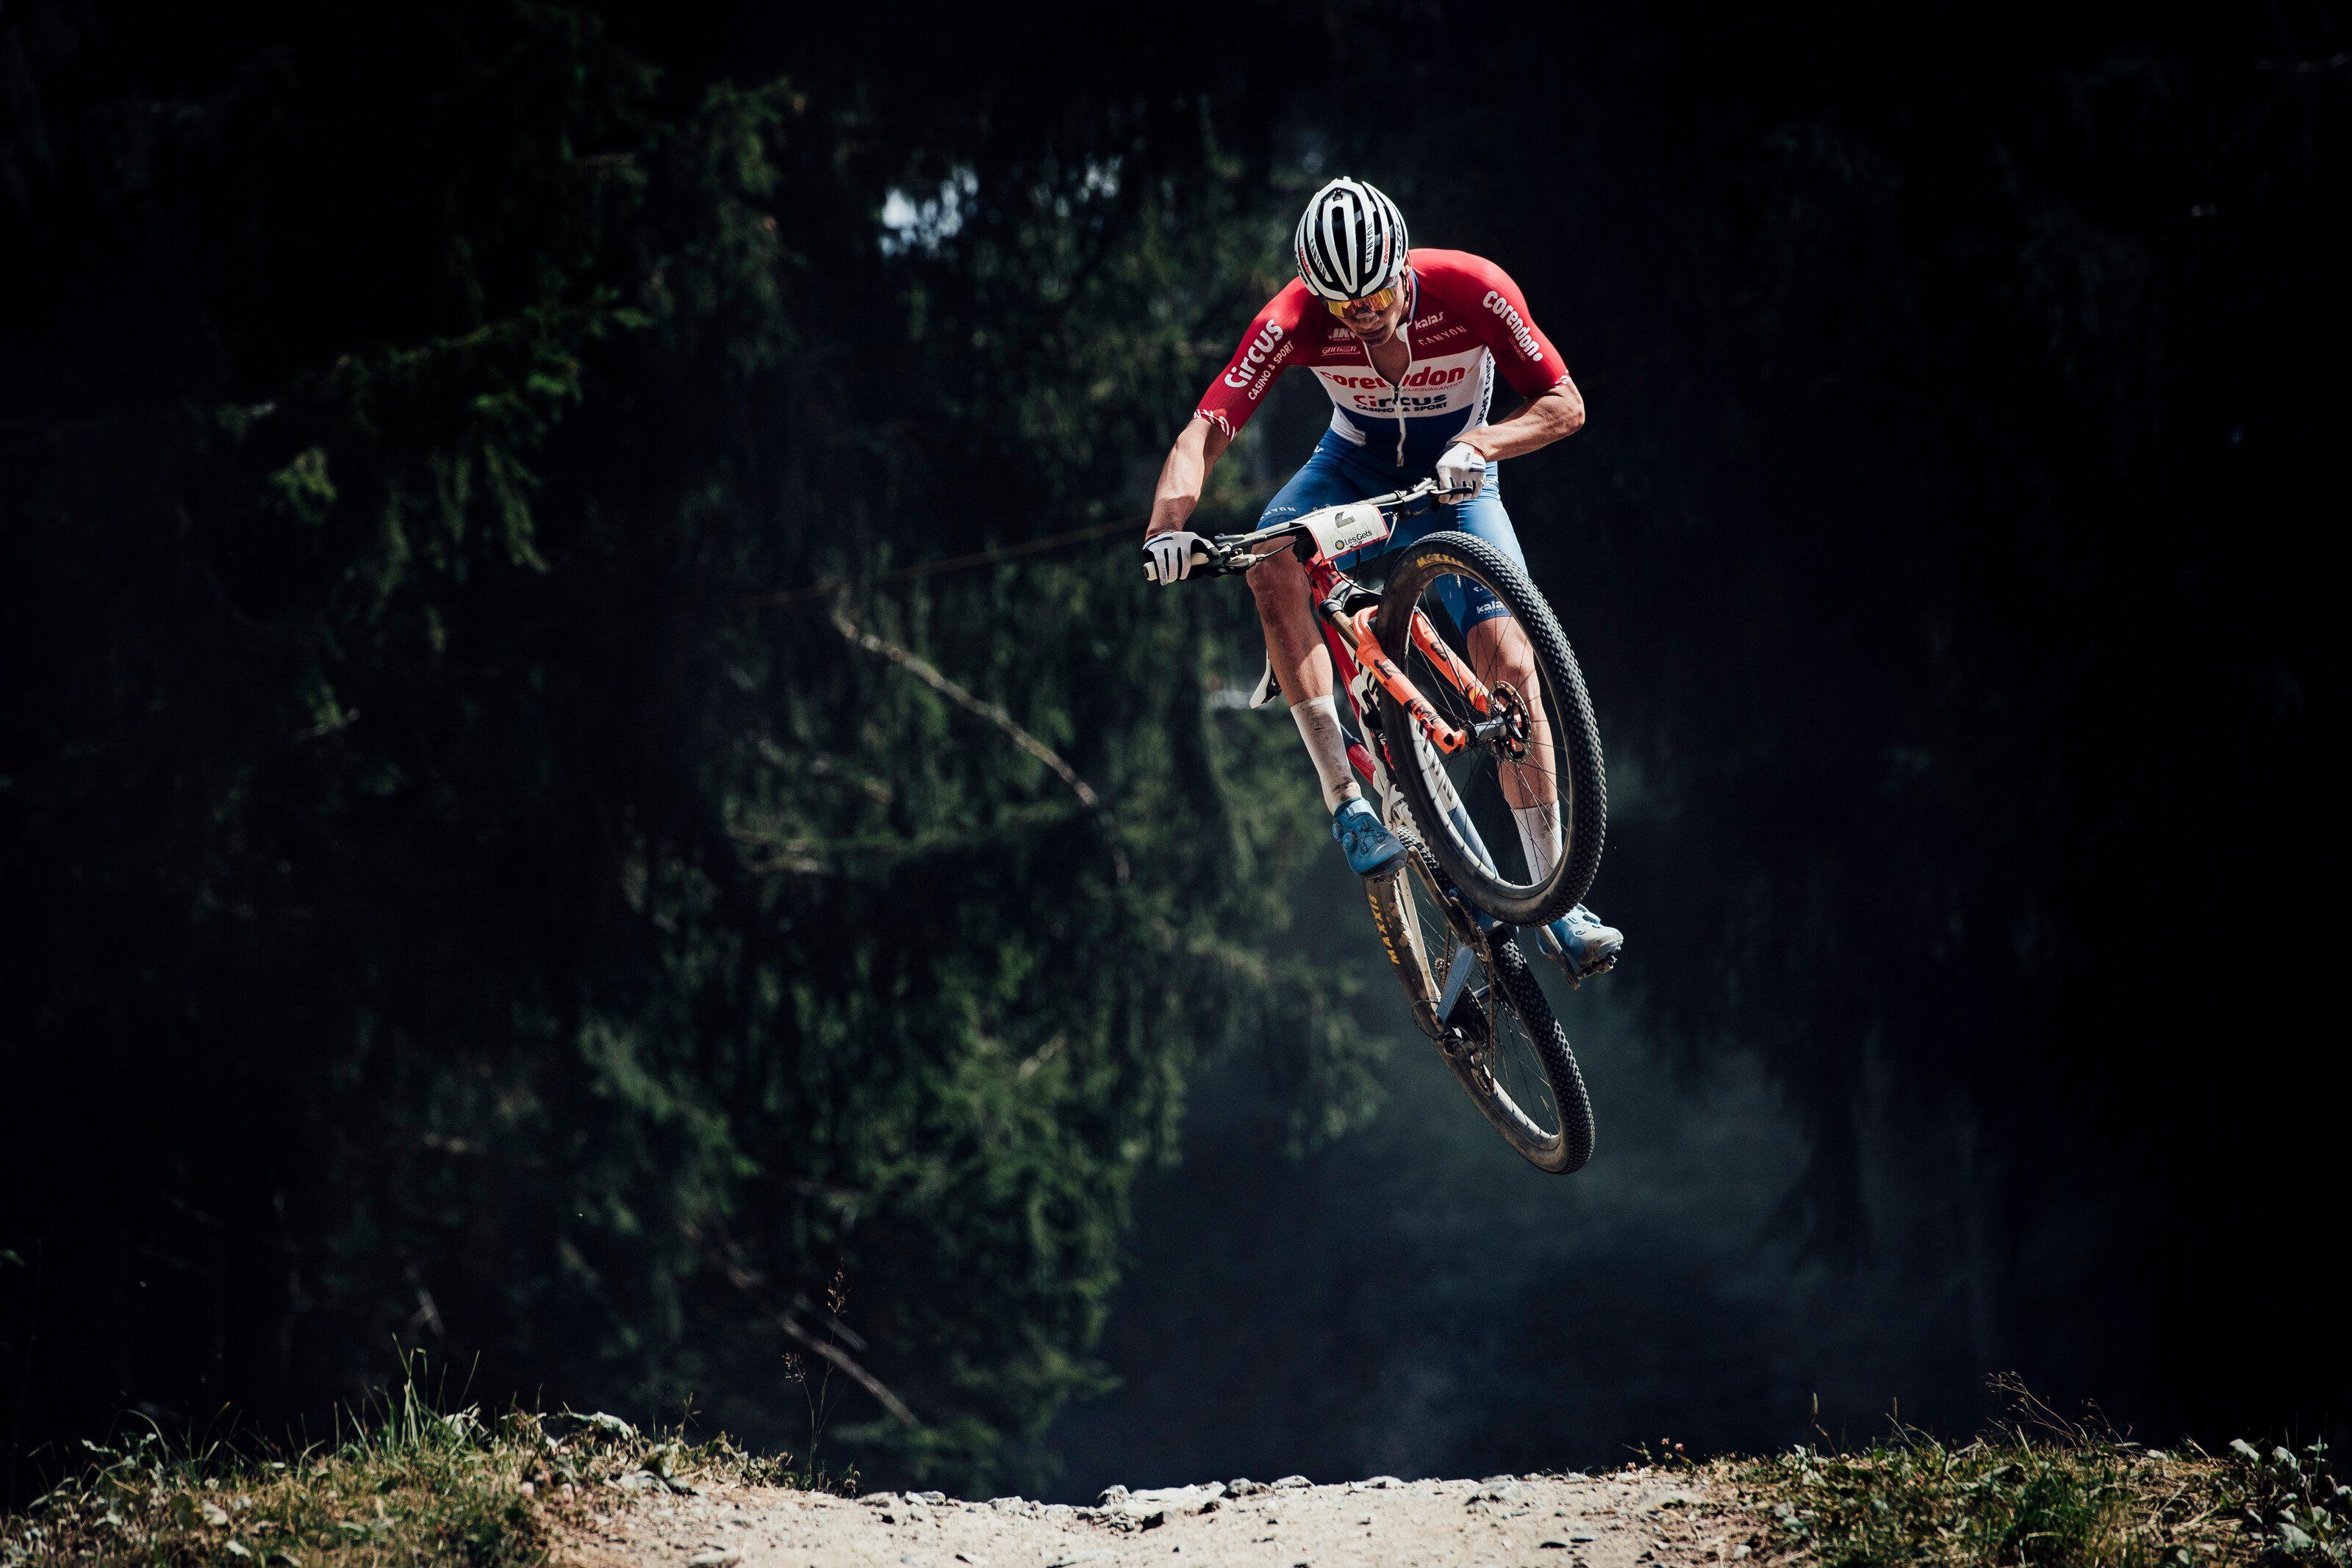 van der poel wants to keep mountain